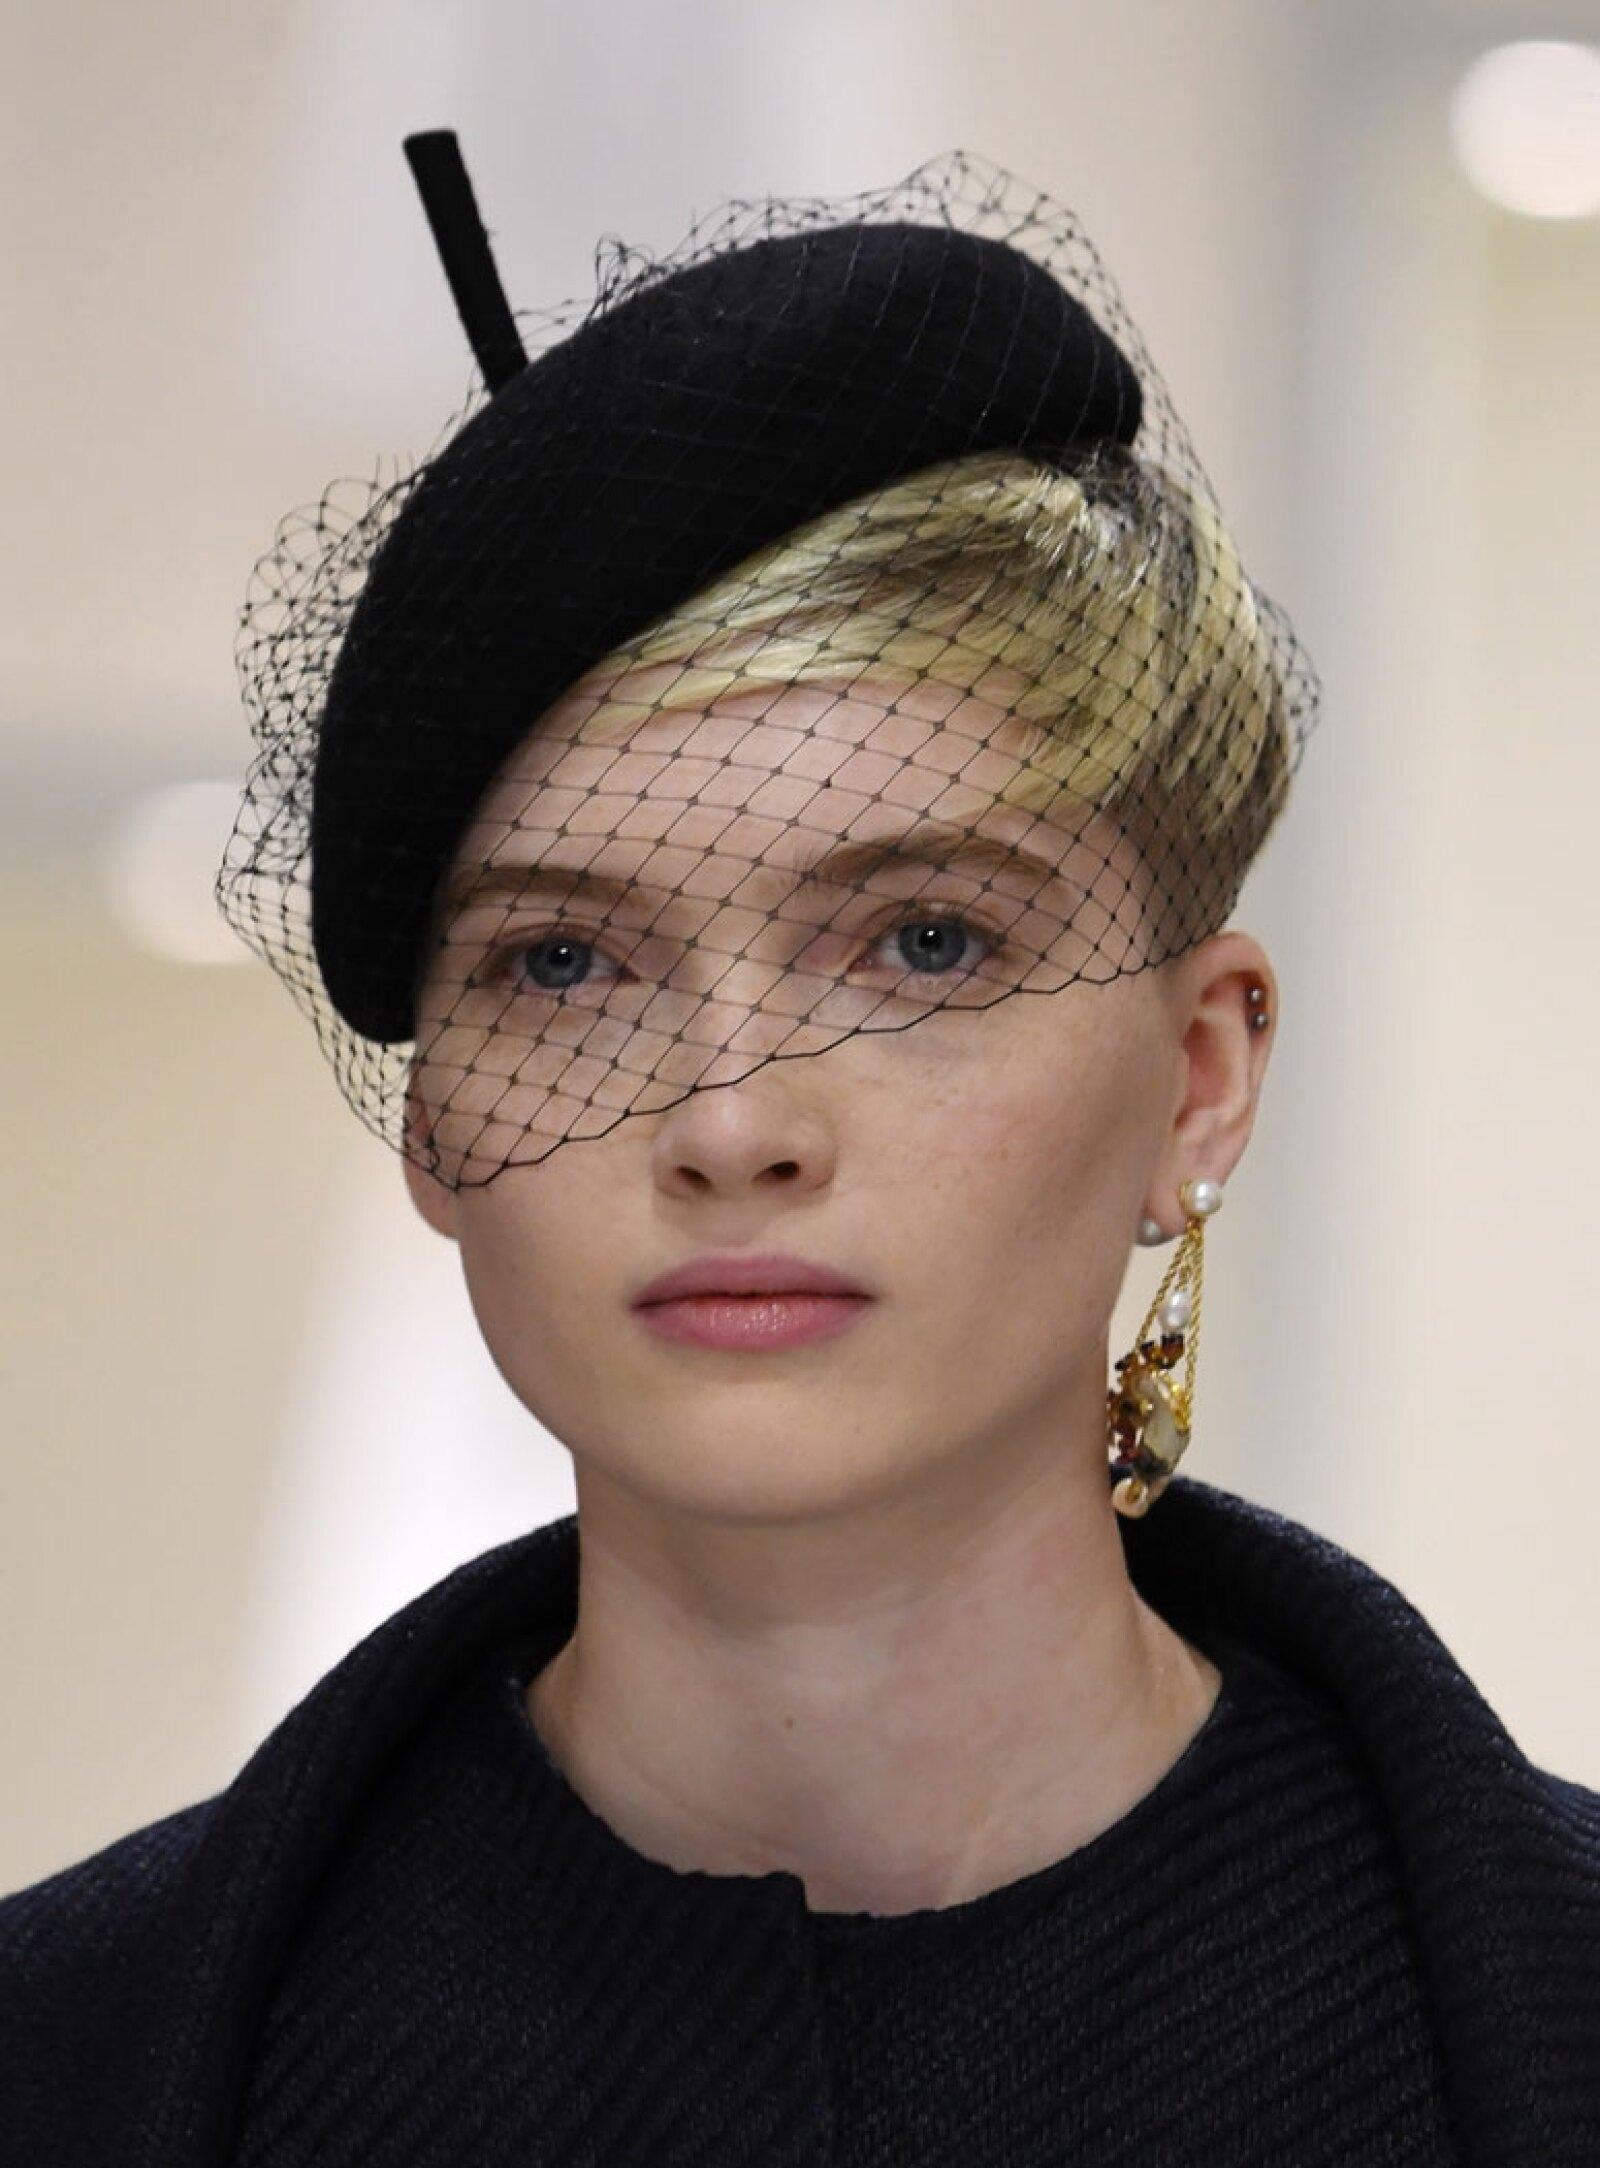 mejores-beauty-looks-haute-couture-7